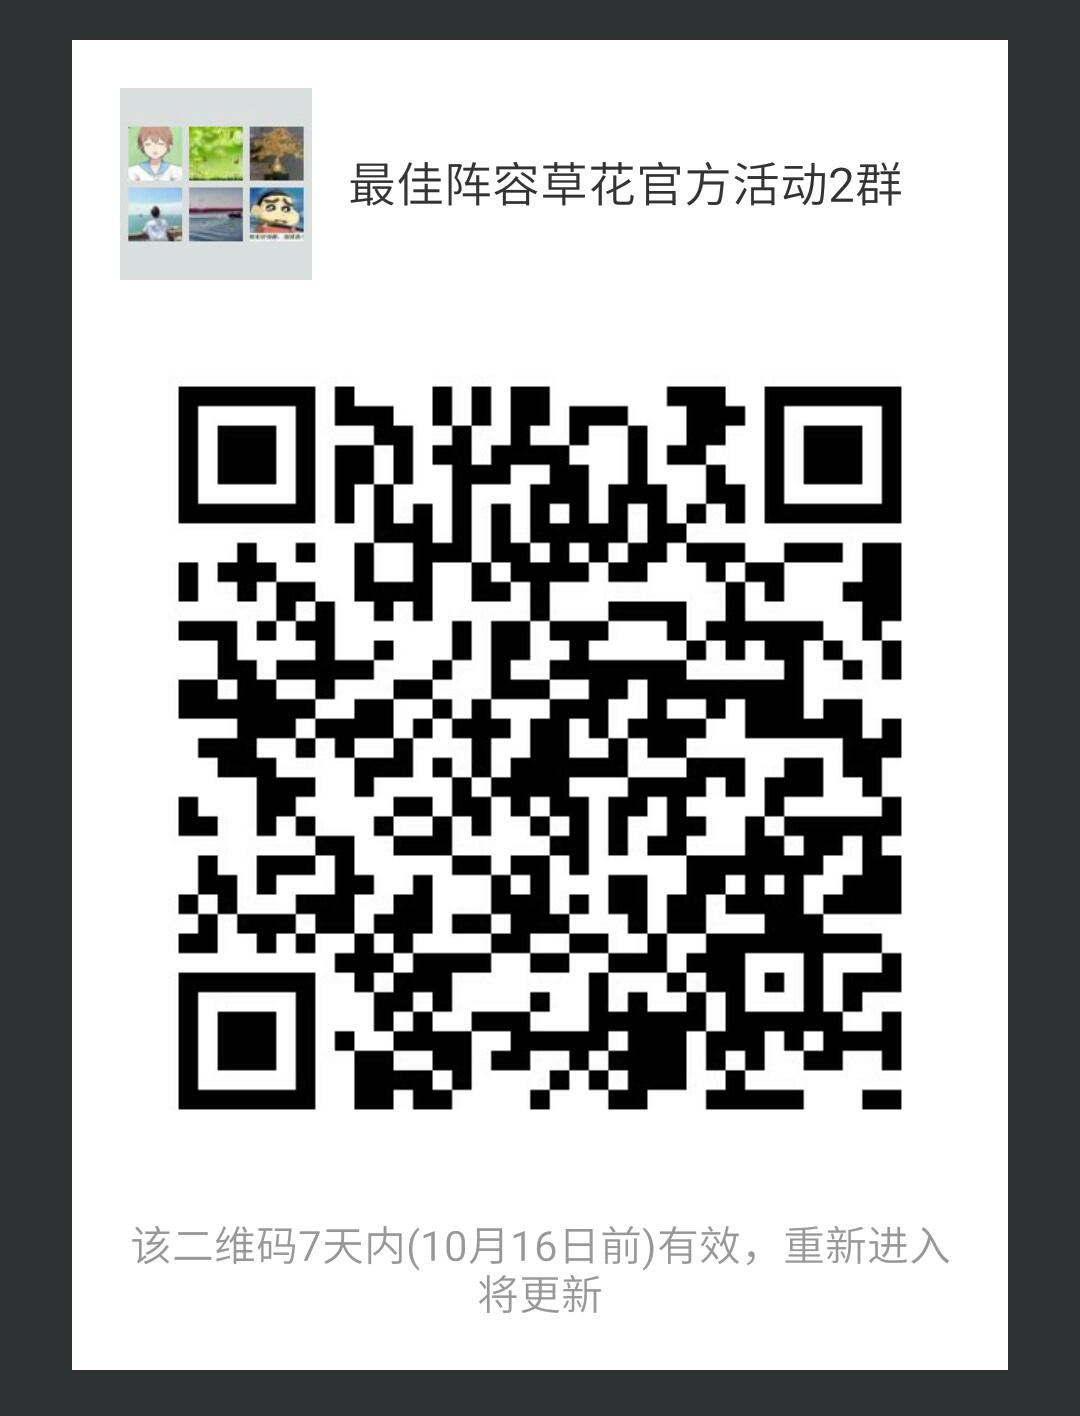 S71009-102930.jpg